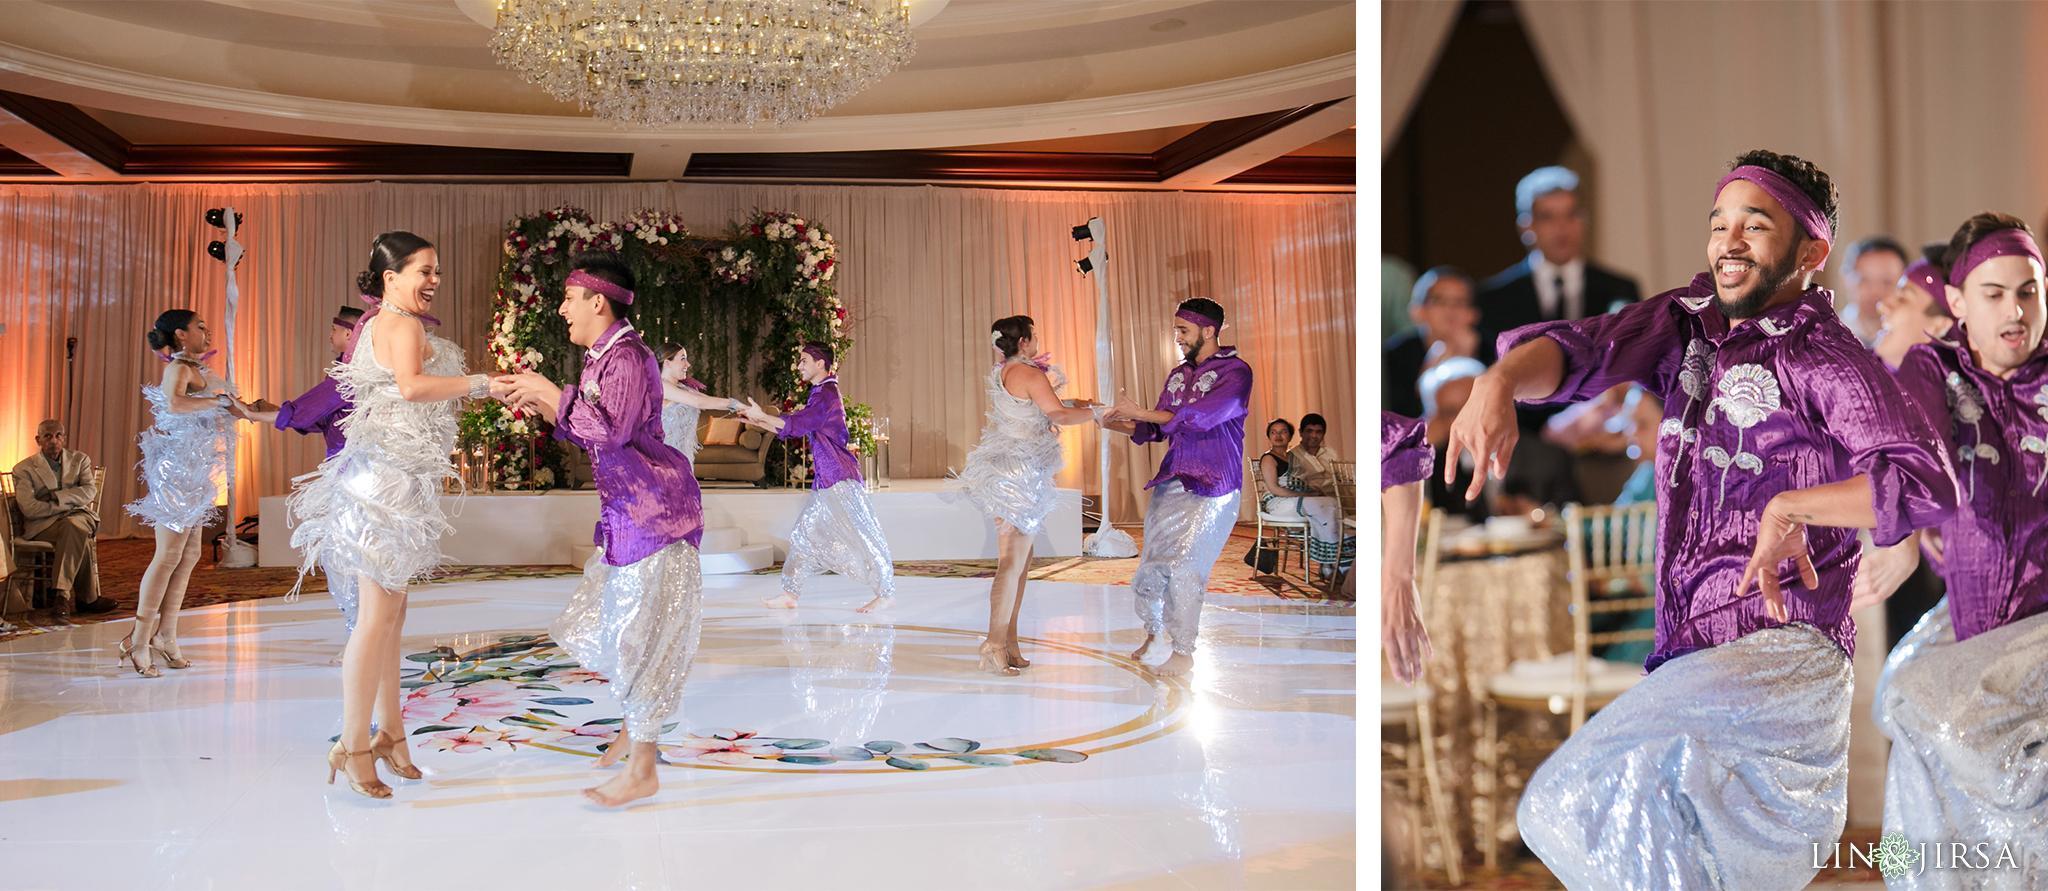 31 Four Seasons Westlake Village Indian Wedding Photographer